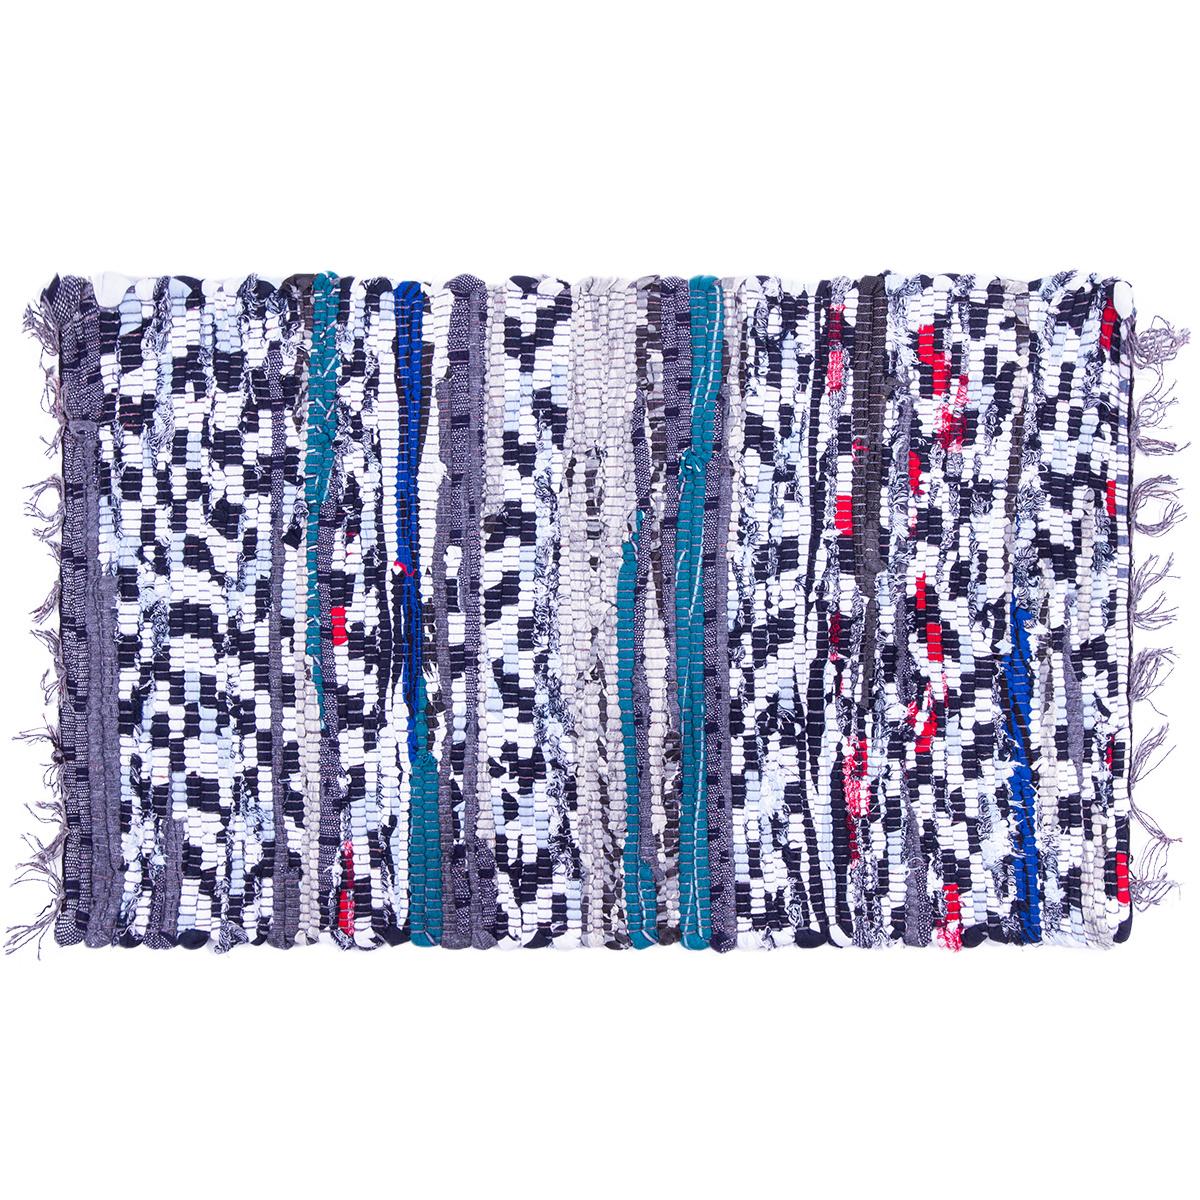 Trade Concept Tkaný kobereček s třásněmi, 40 x 60 cm